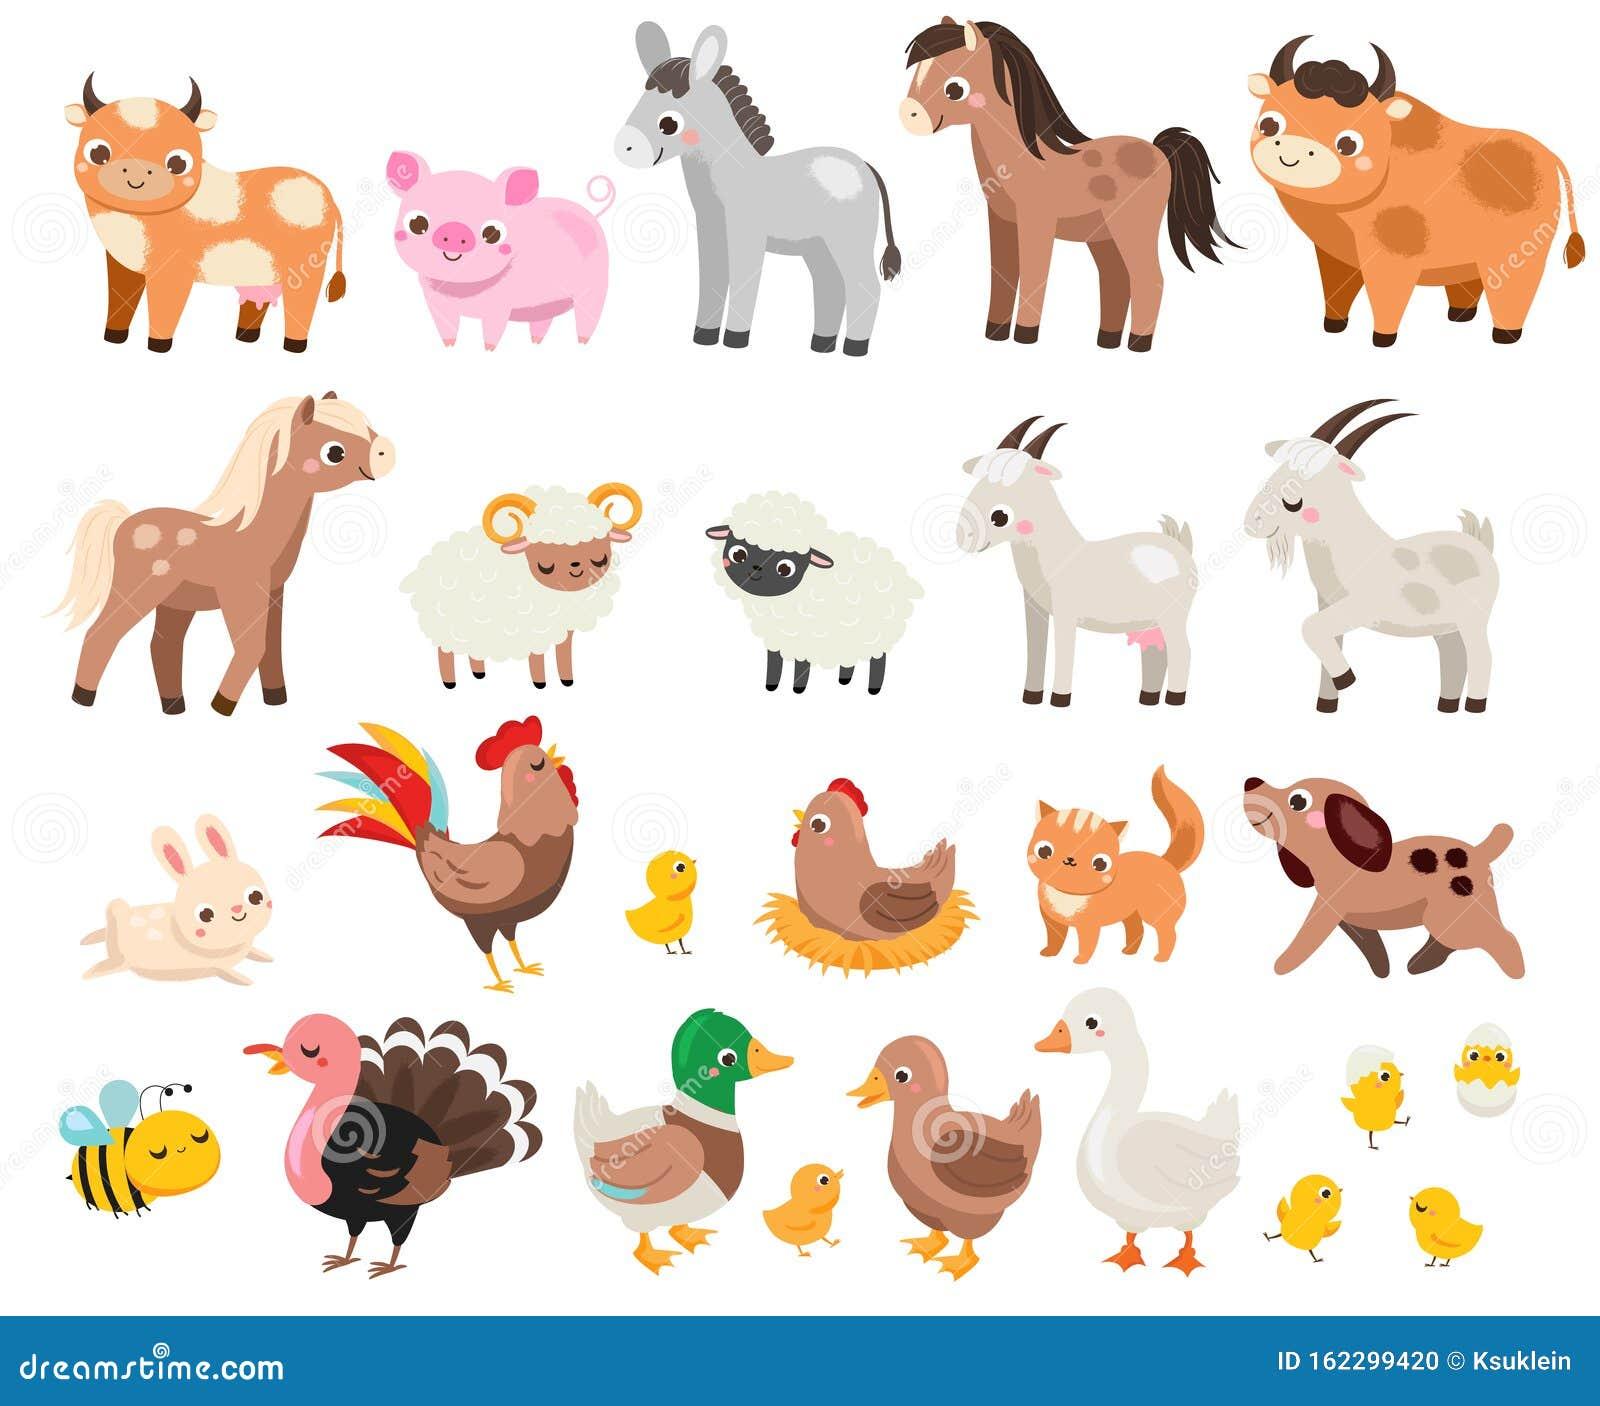 animals farm cartoon children pets cute many pig horse domestic cow creatures donkey illustration